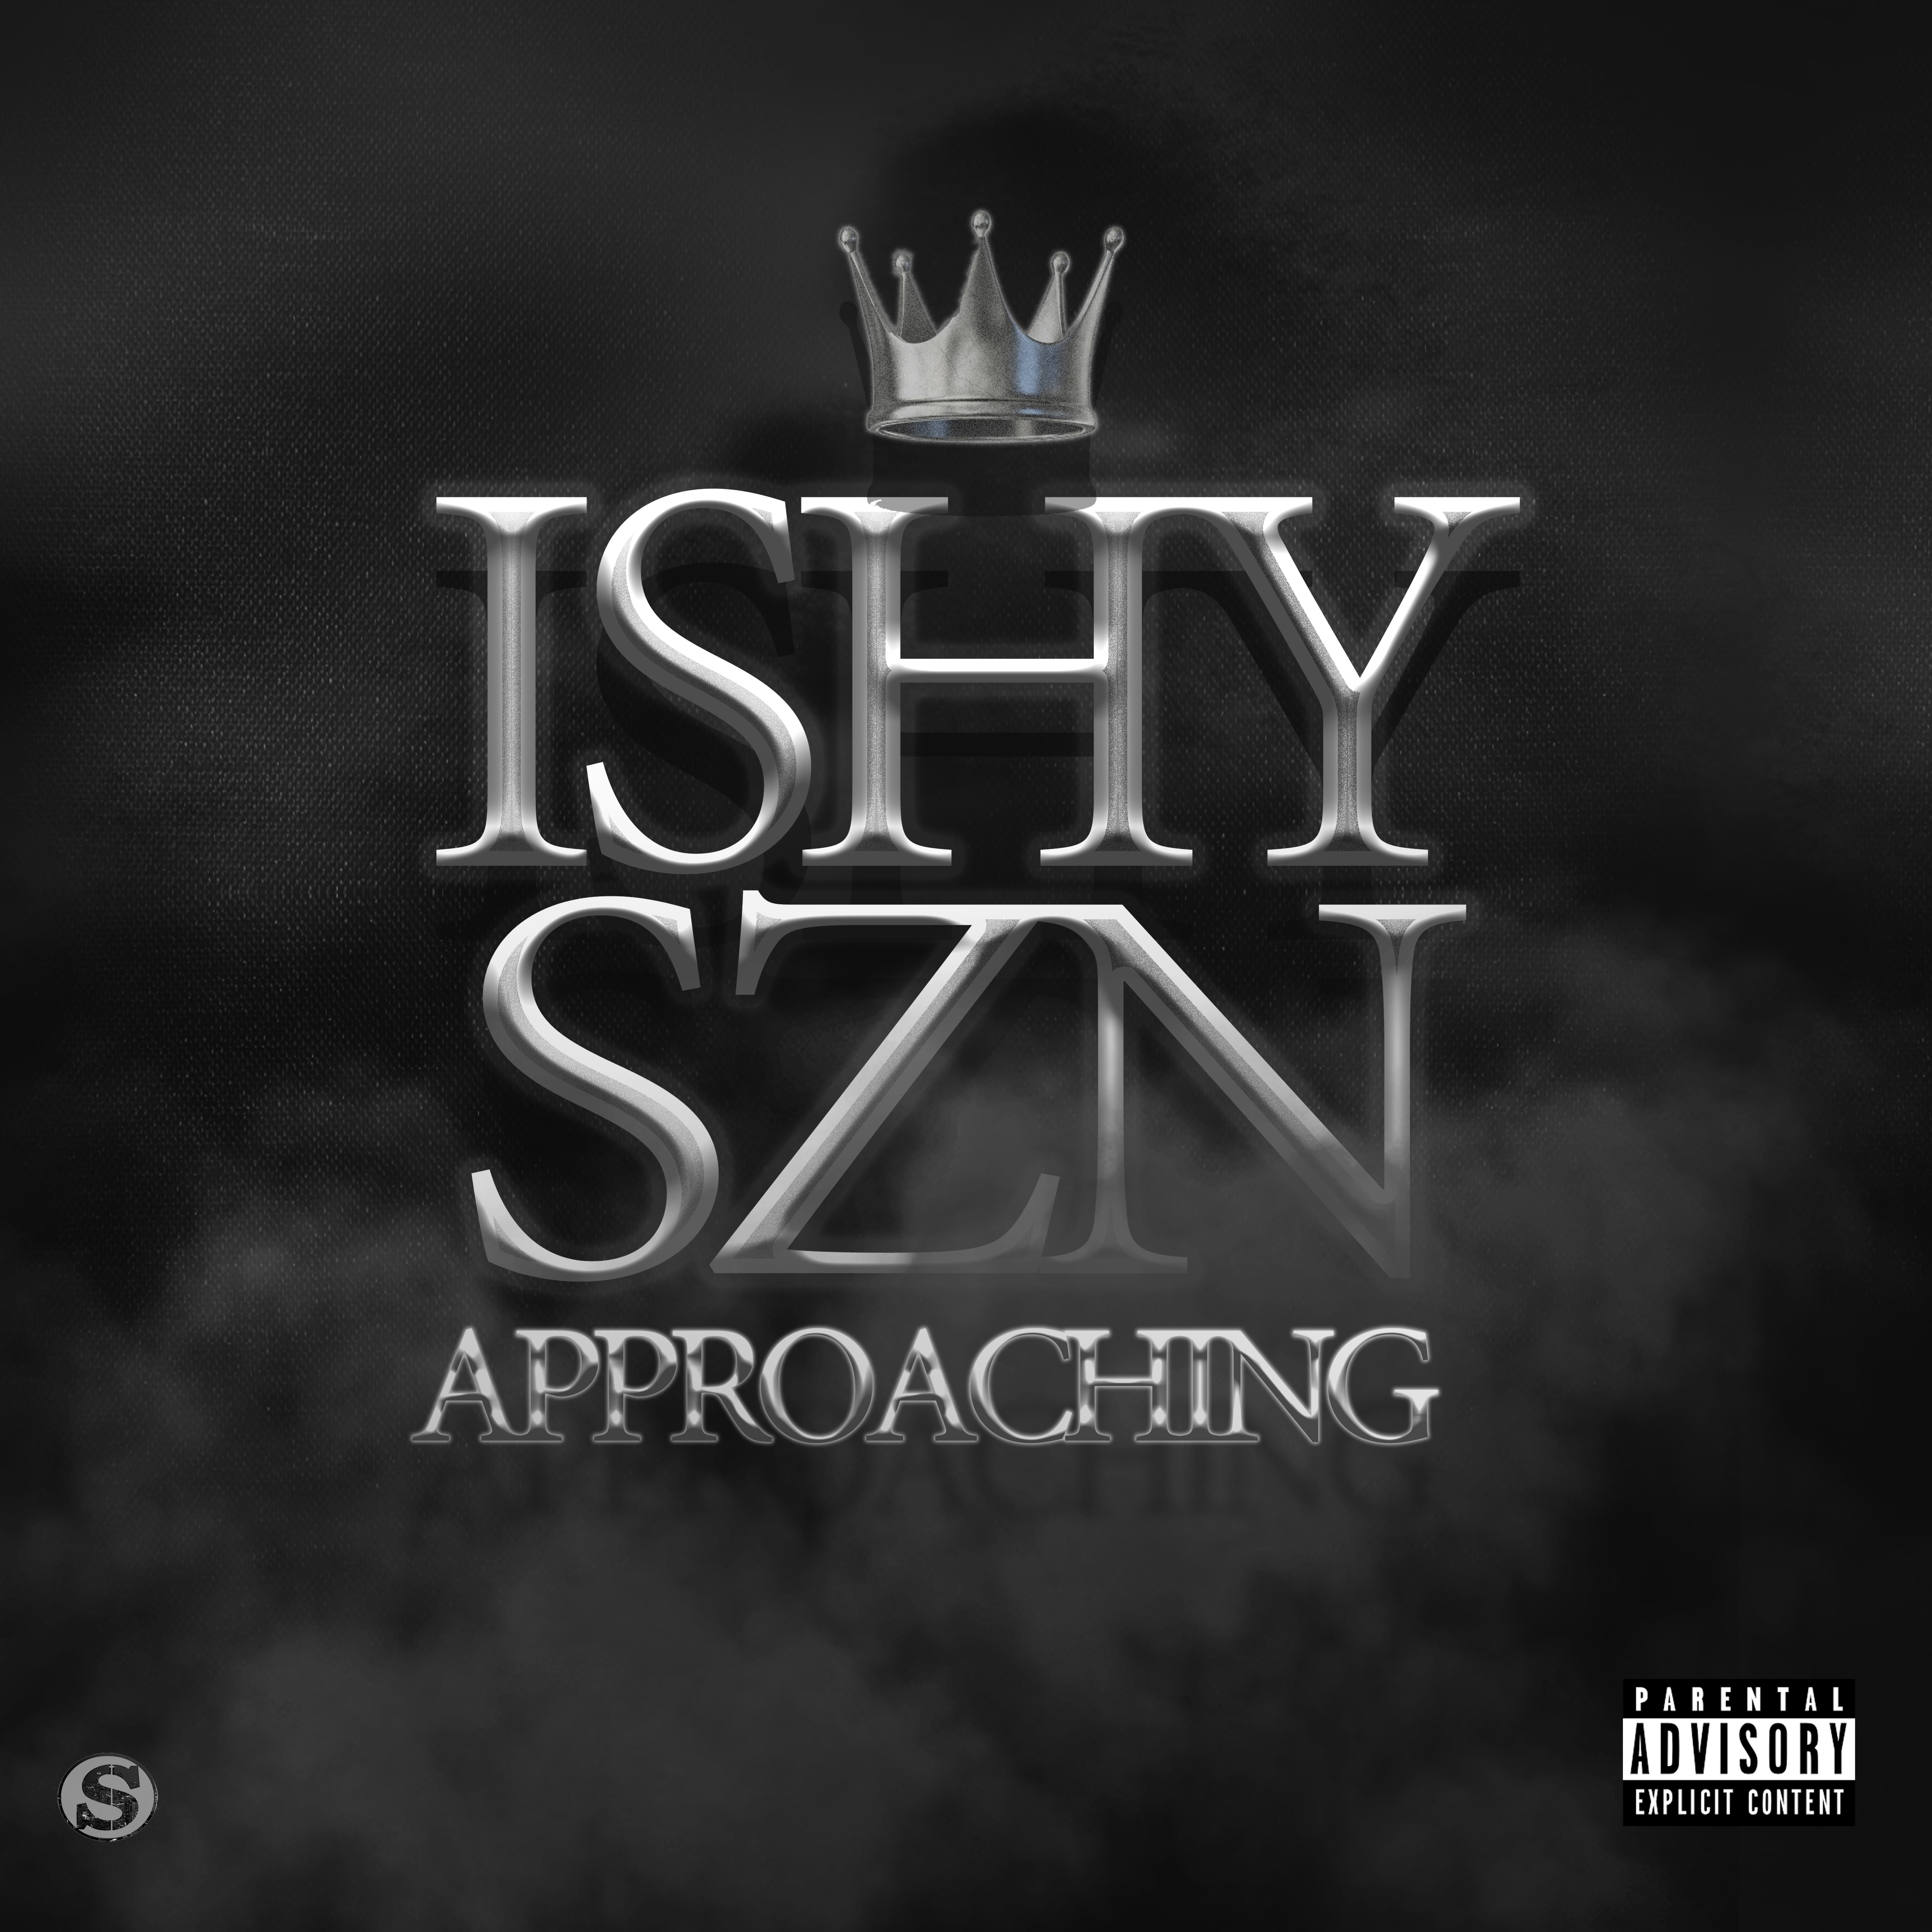 ISHY SZN Cover Art